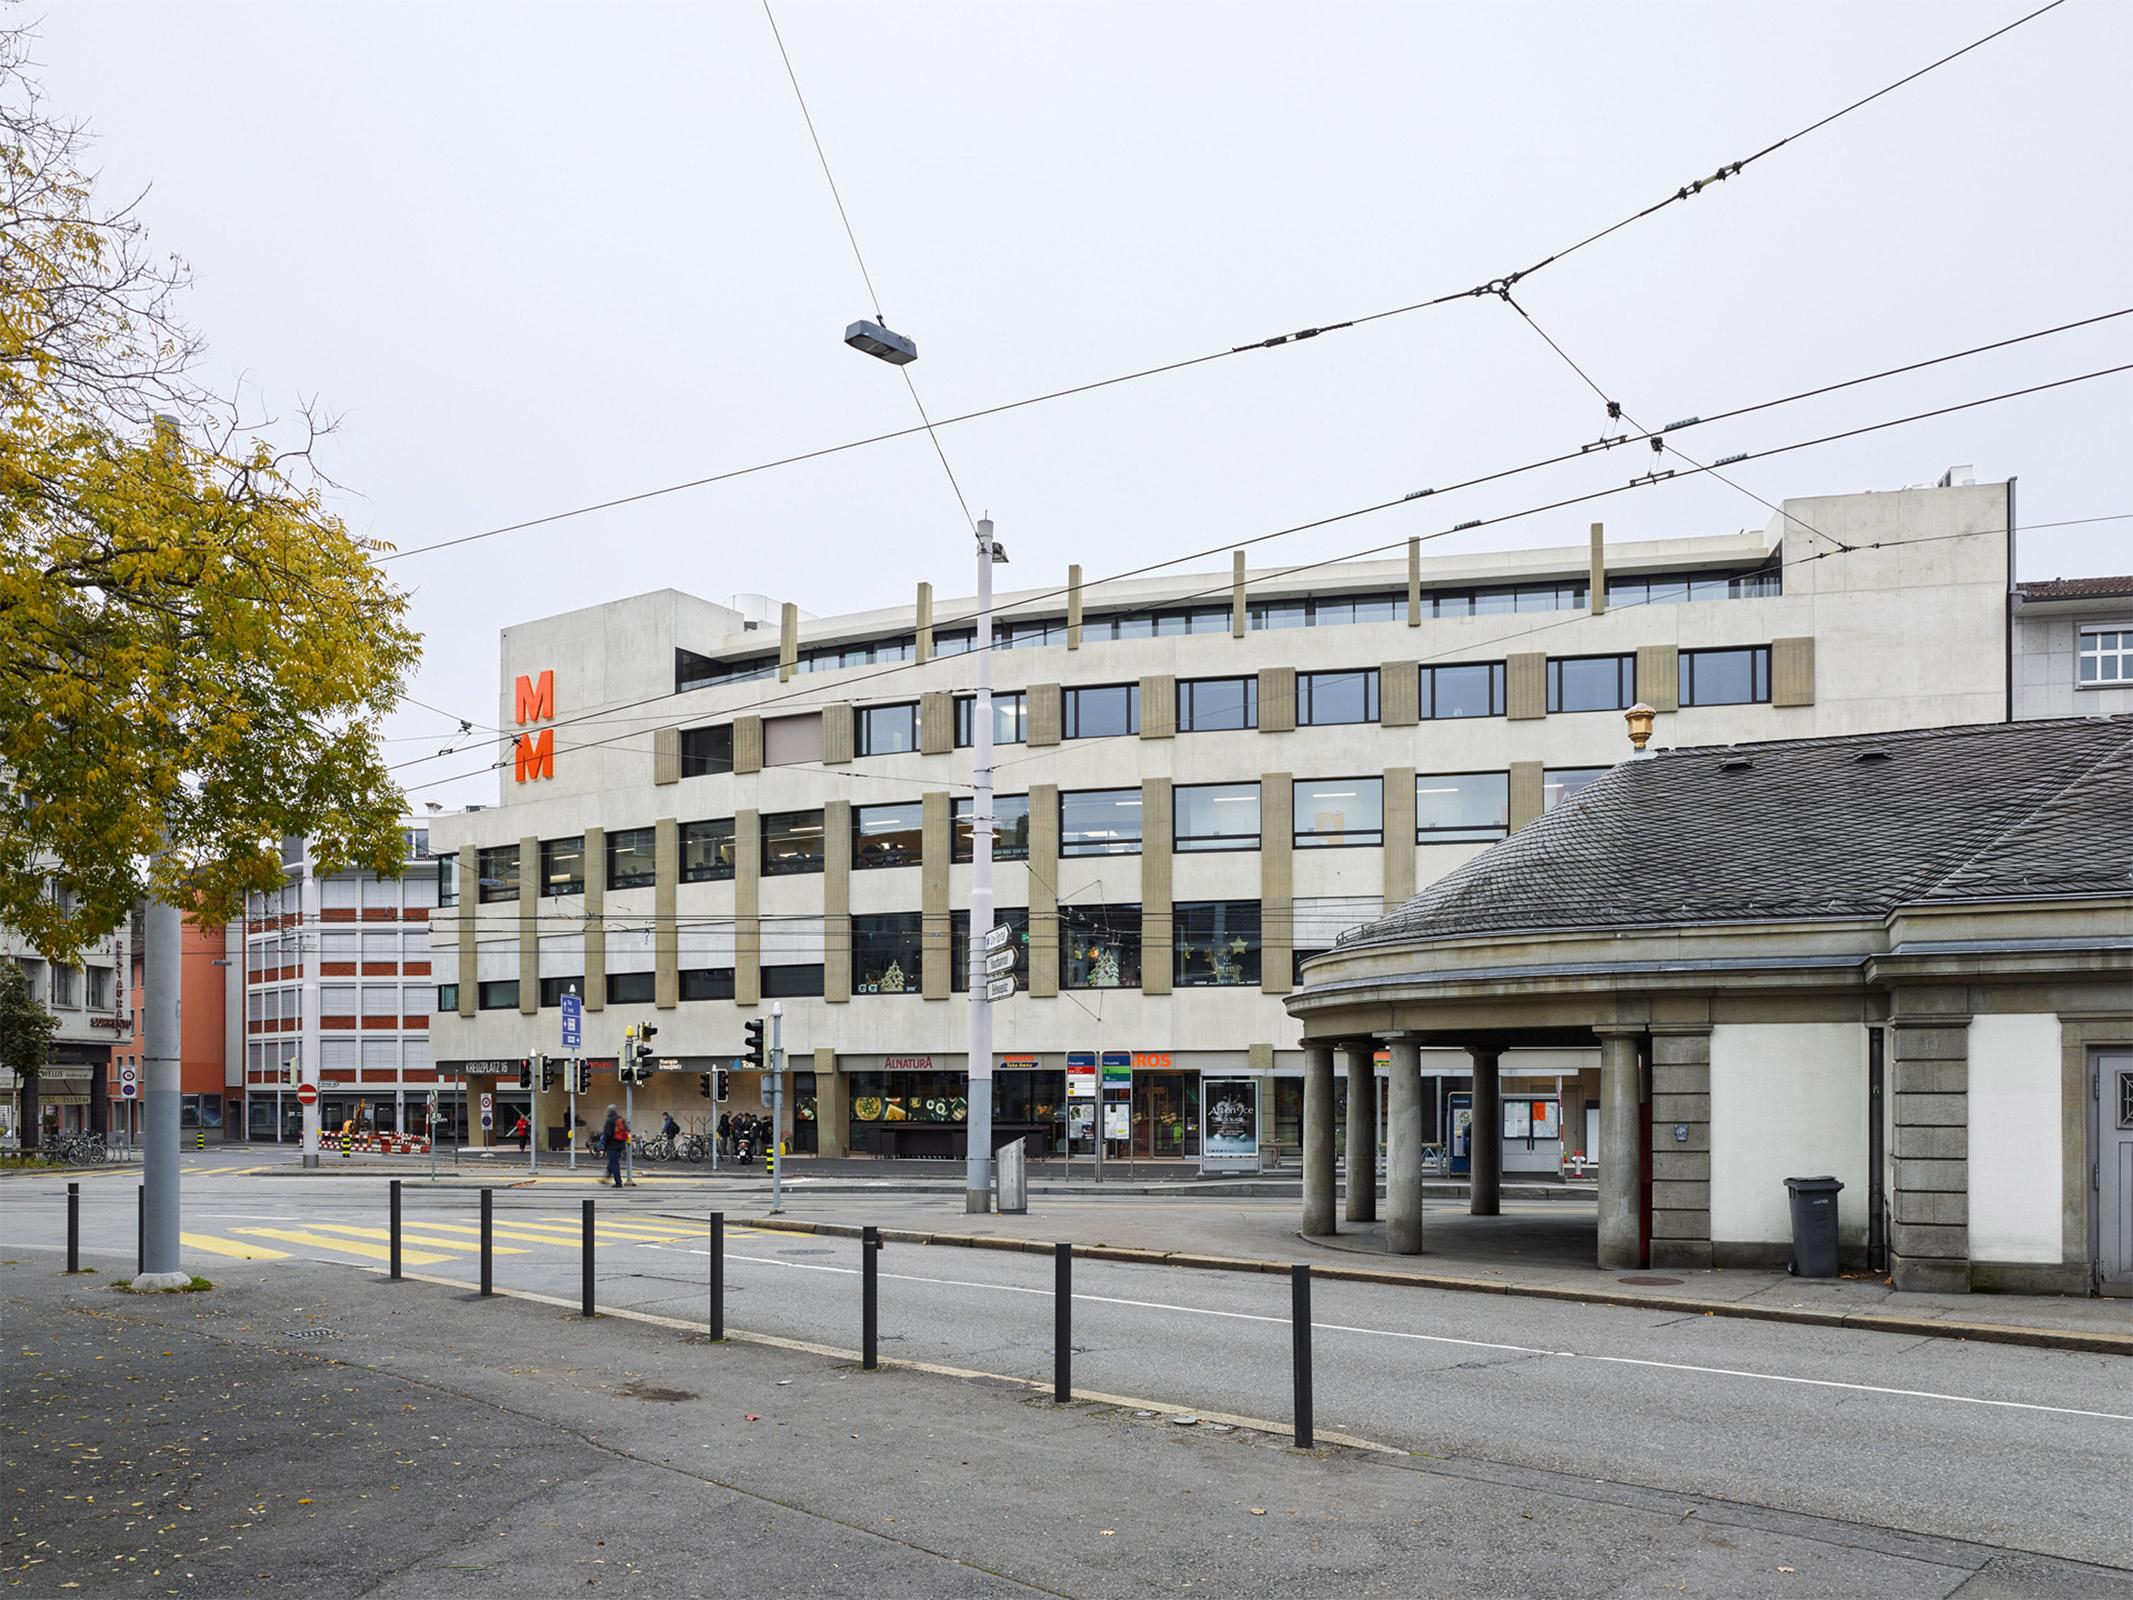 205Migros Kreuzplatz Zürich